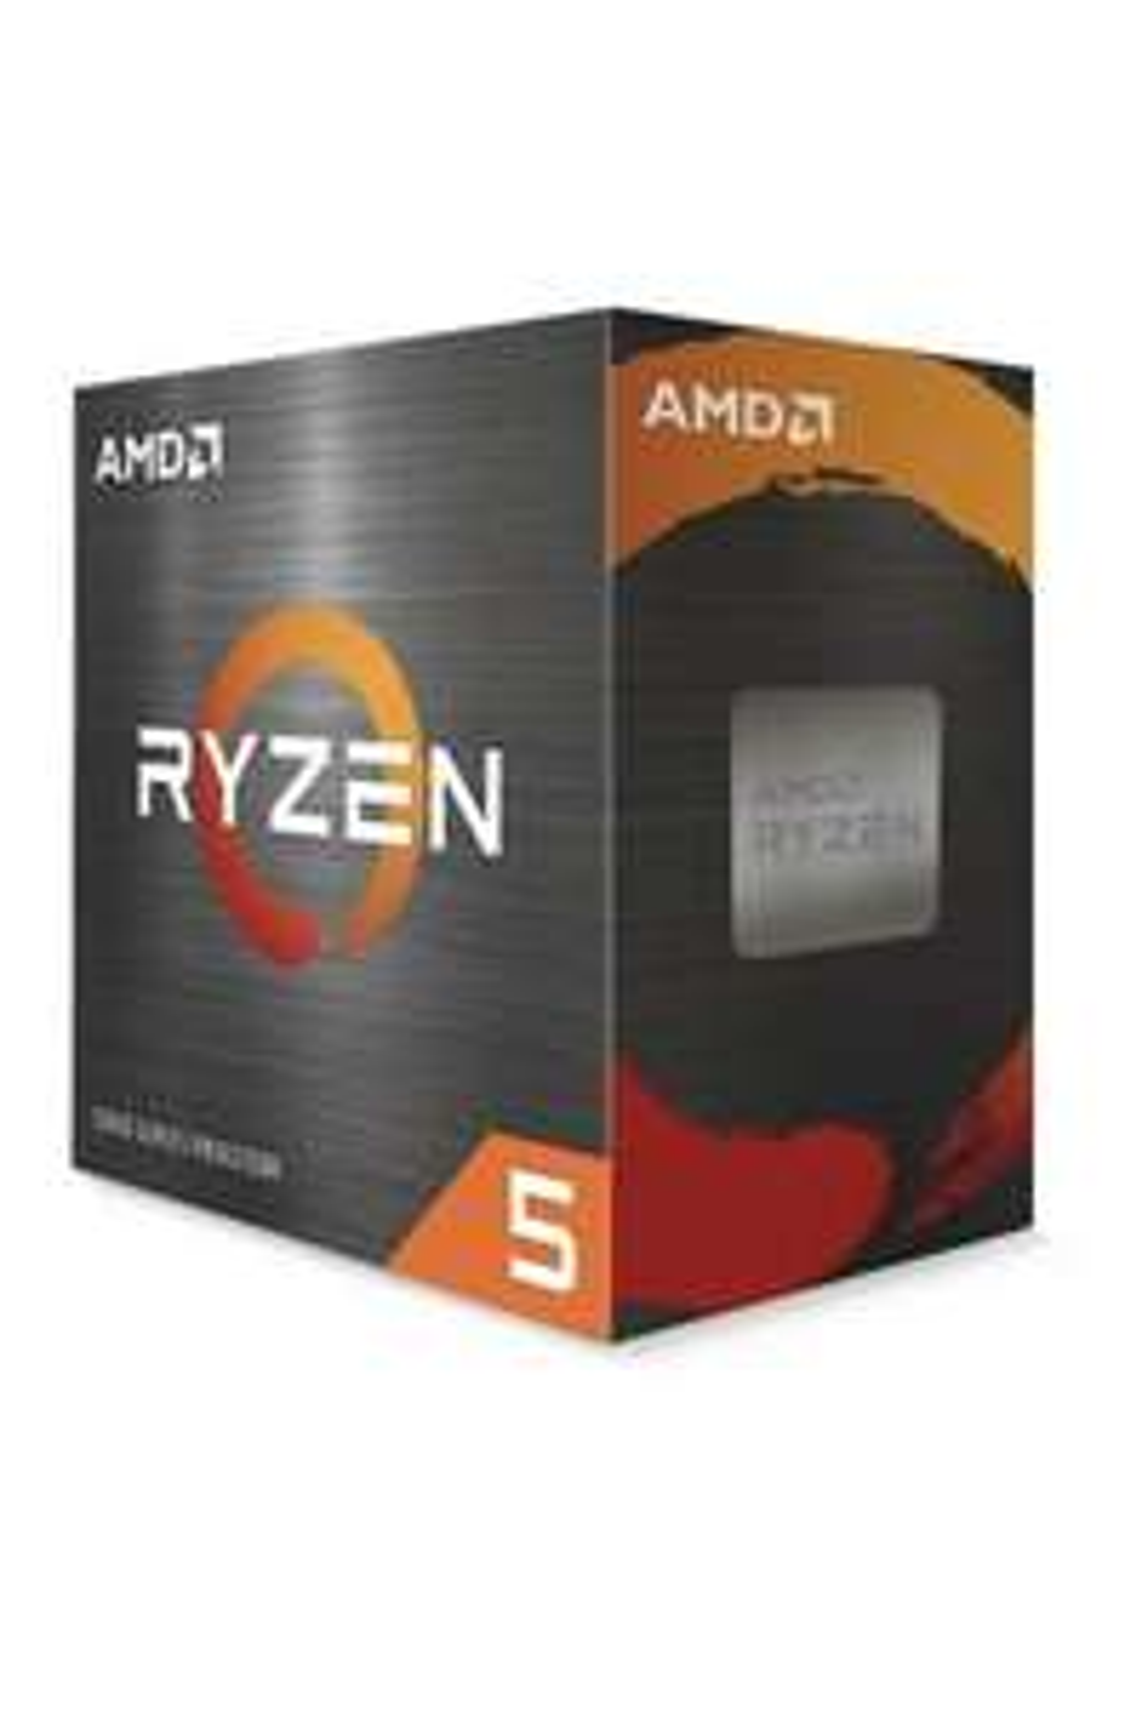 AMD Ryzen 5 5600x Boxed, 6C/12T, 3,7GHz-4,6GHz